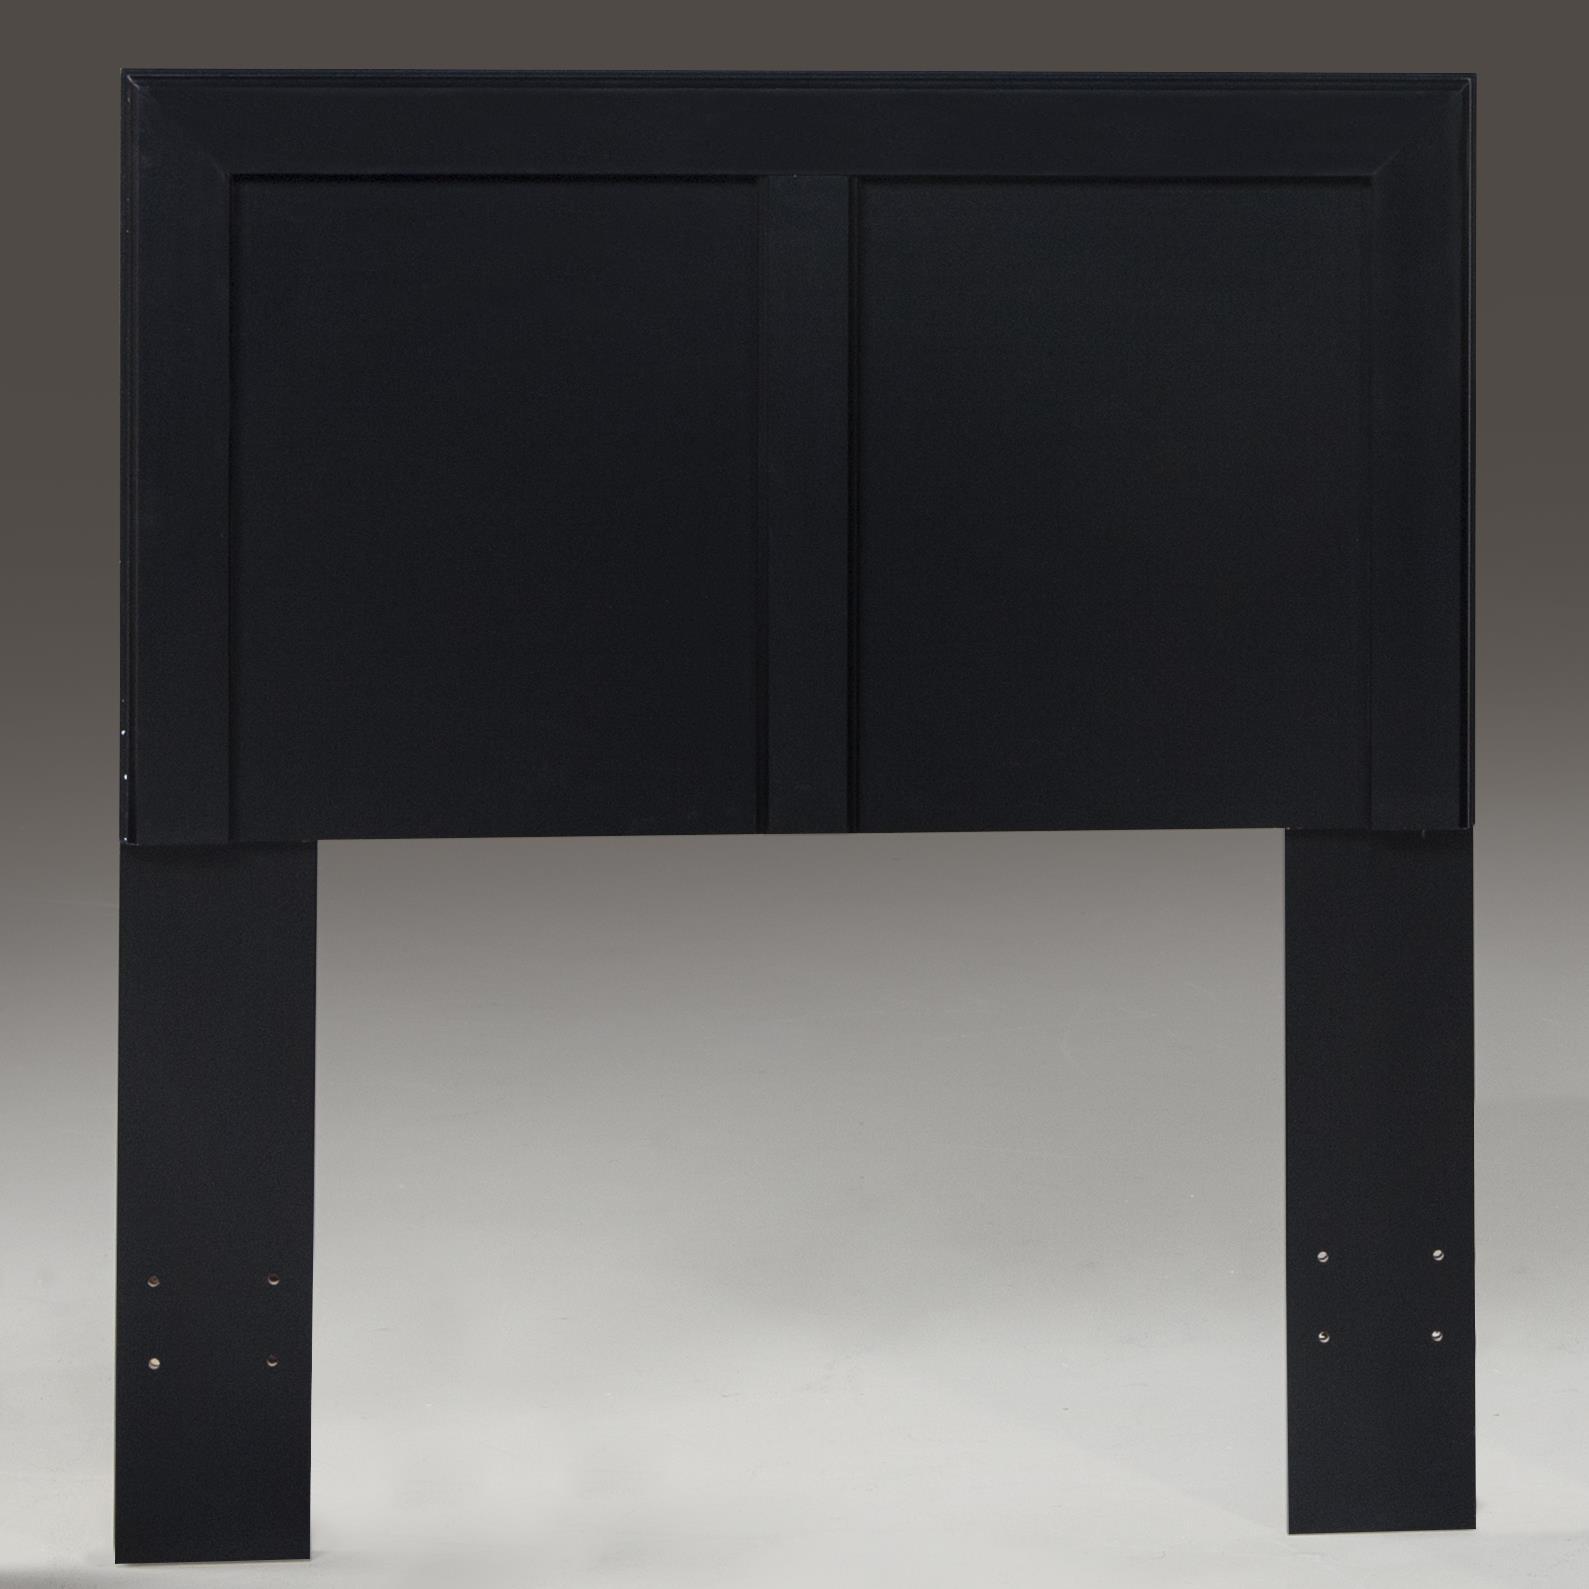 Kith Furniture 195 Black Twin Headboard - Item Number: 195-33